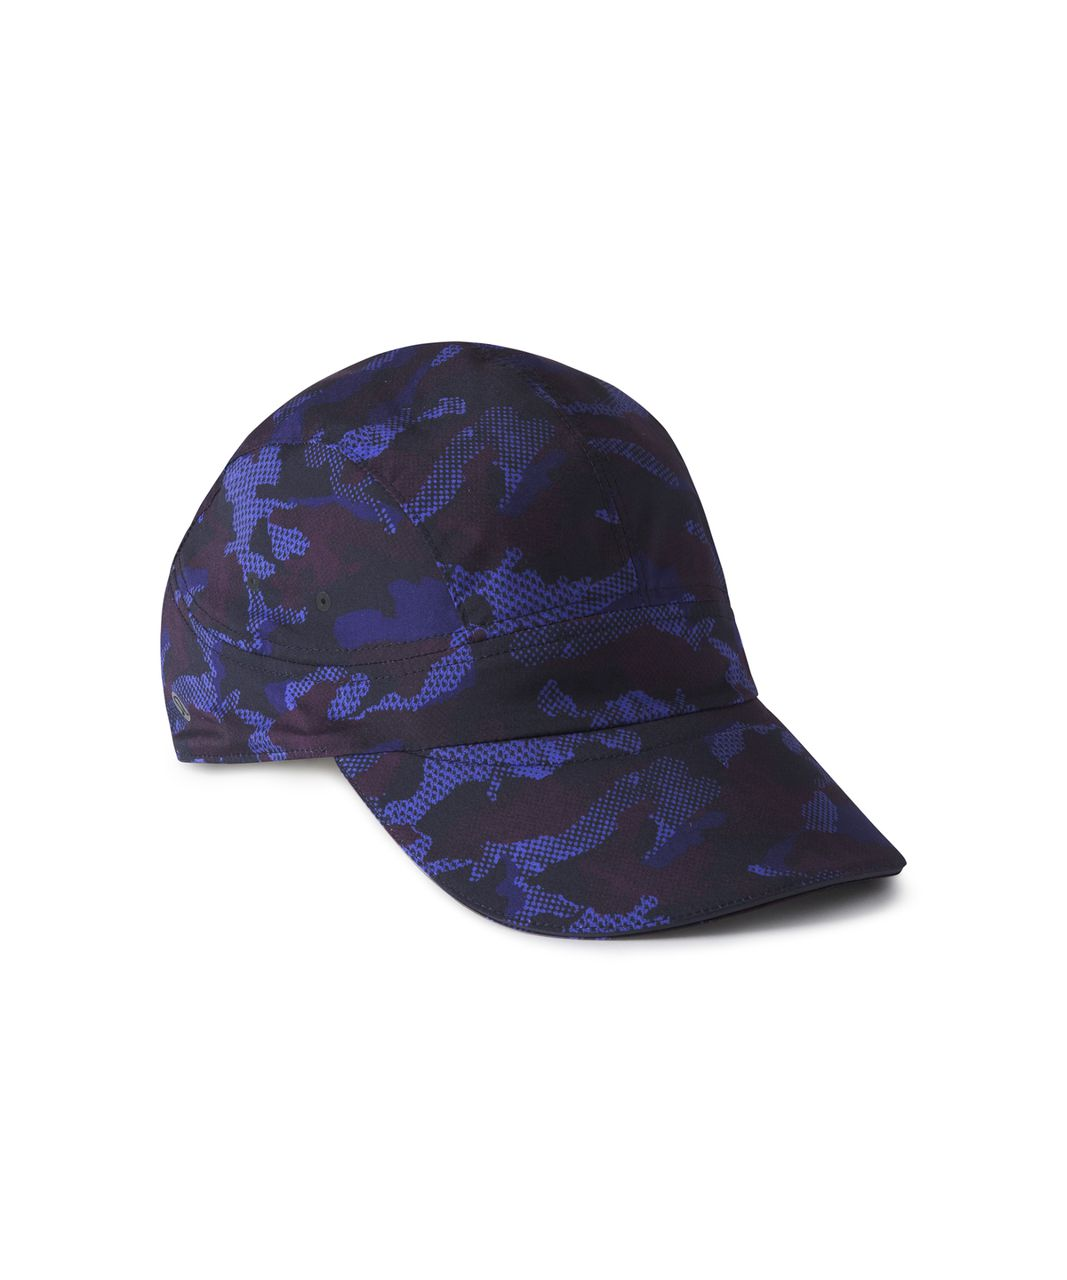 Lululemon Race To Place Run Hat 2.0 - Hounds Camo Emperor Blue Black